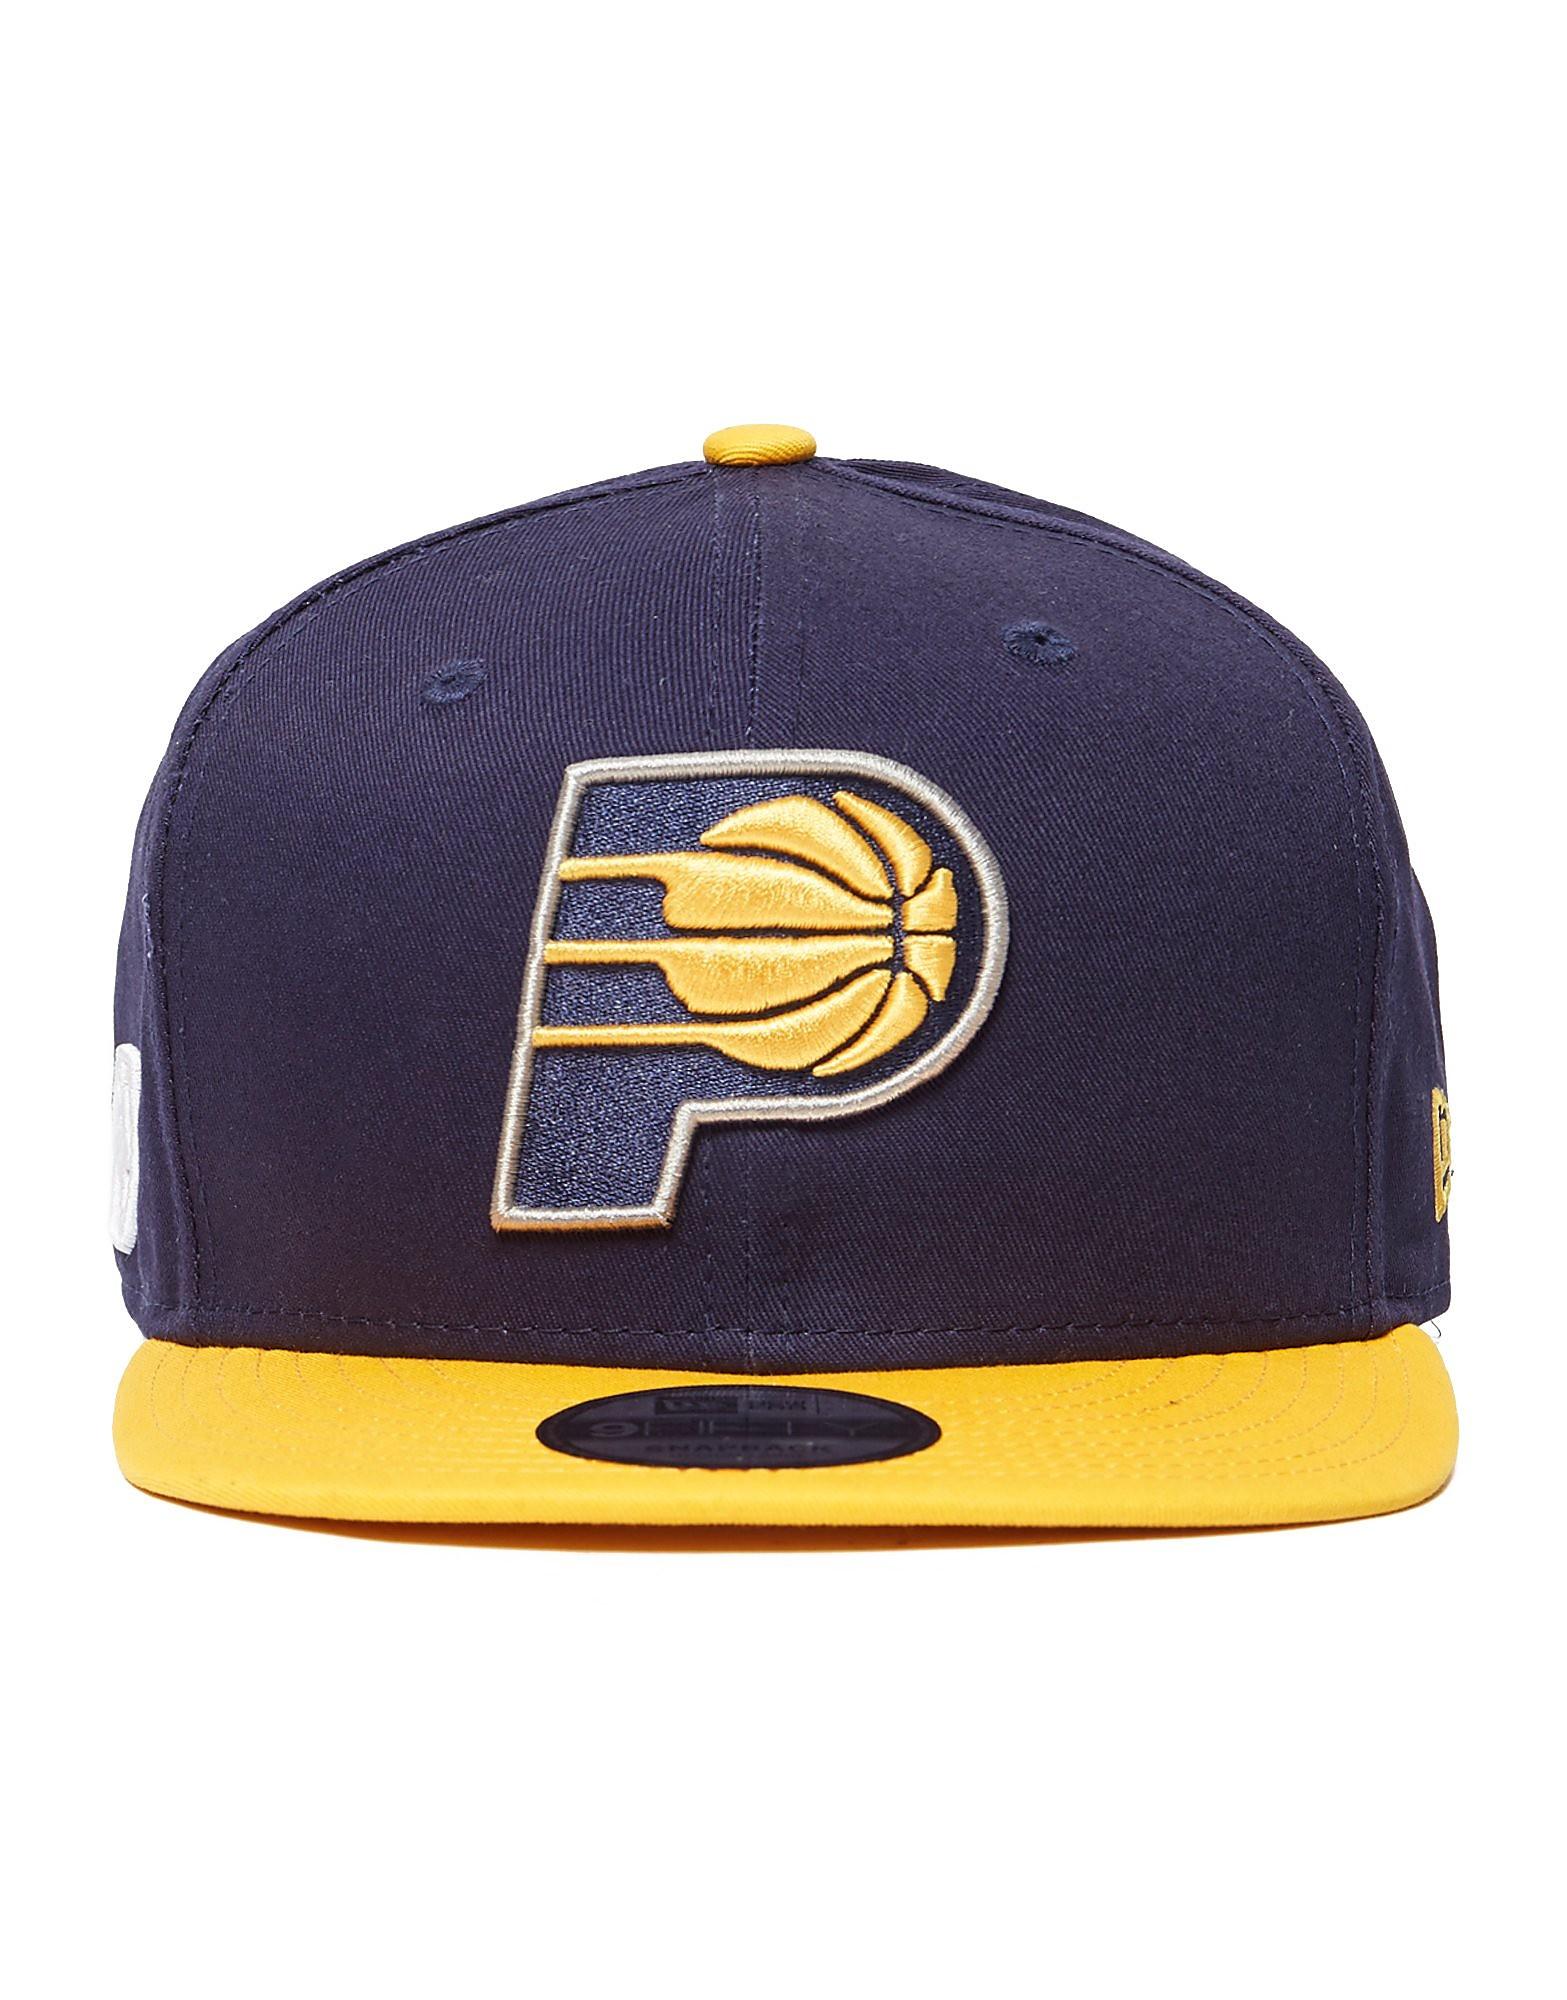 New Era NBA Indiana Pacers 9FIFTY Snapback Cap